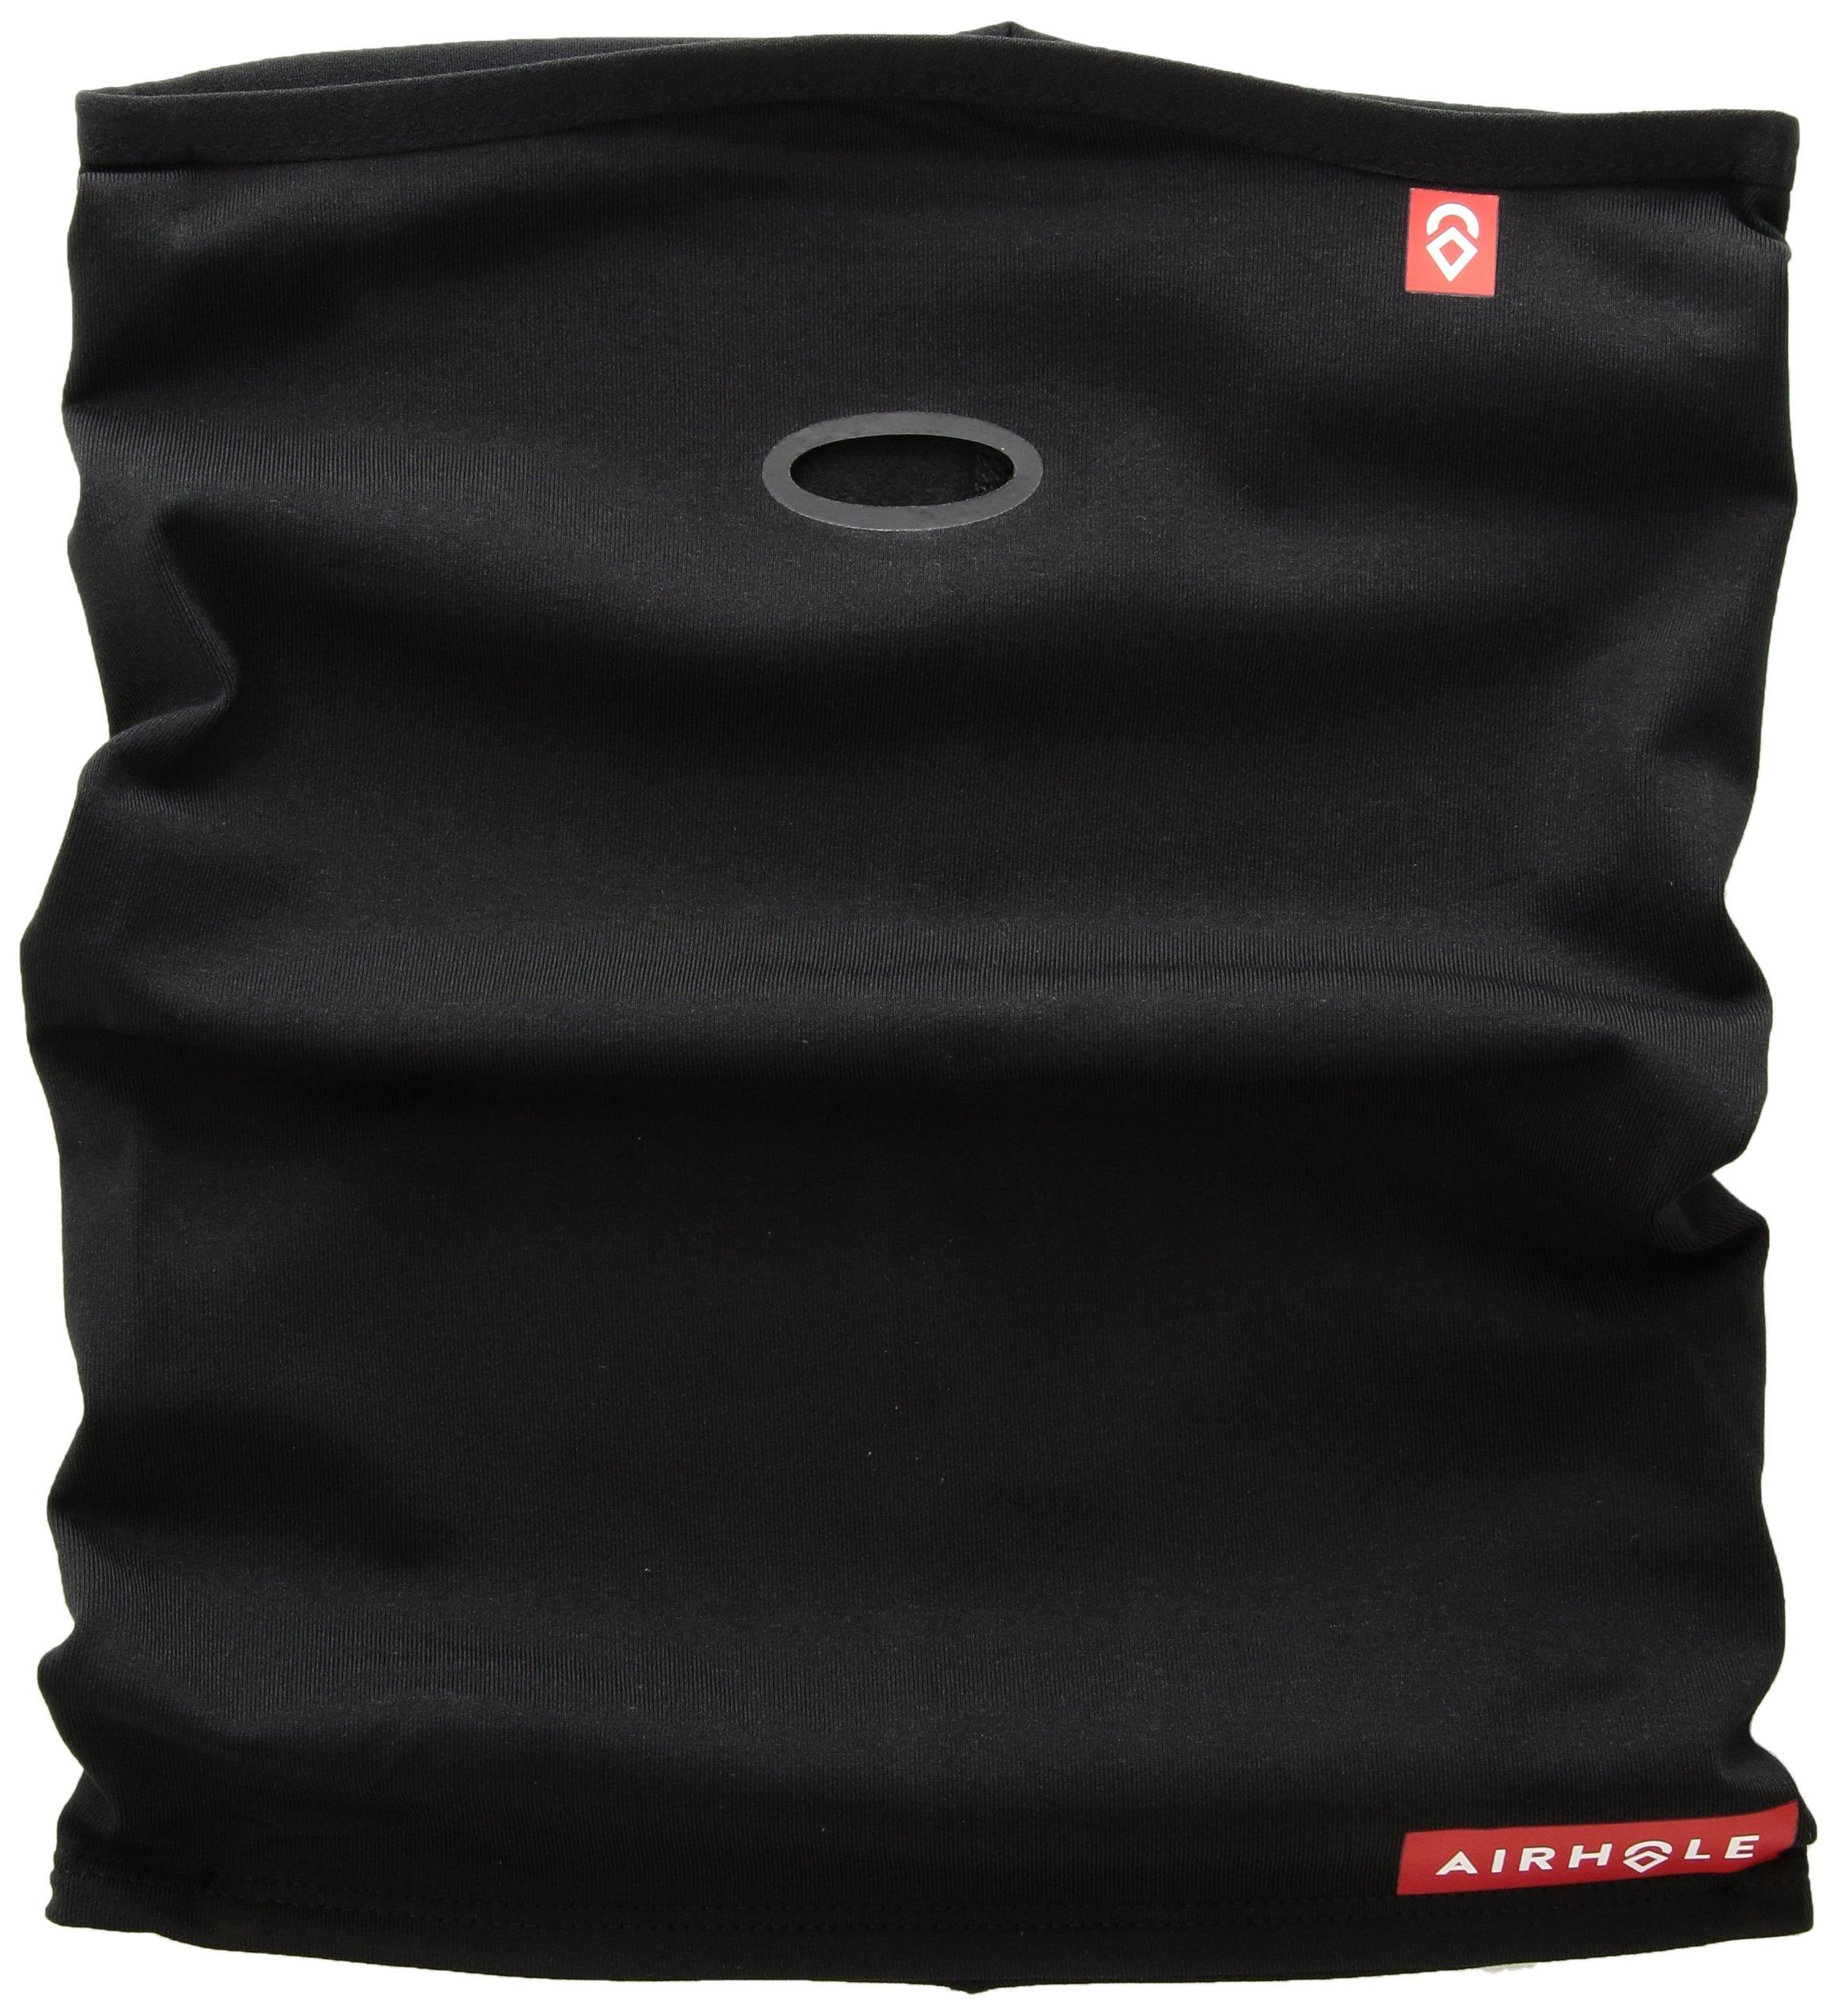 Airhole Airtube Ergo Drytech Headwear, Black, Medium/Large